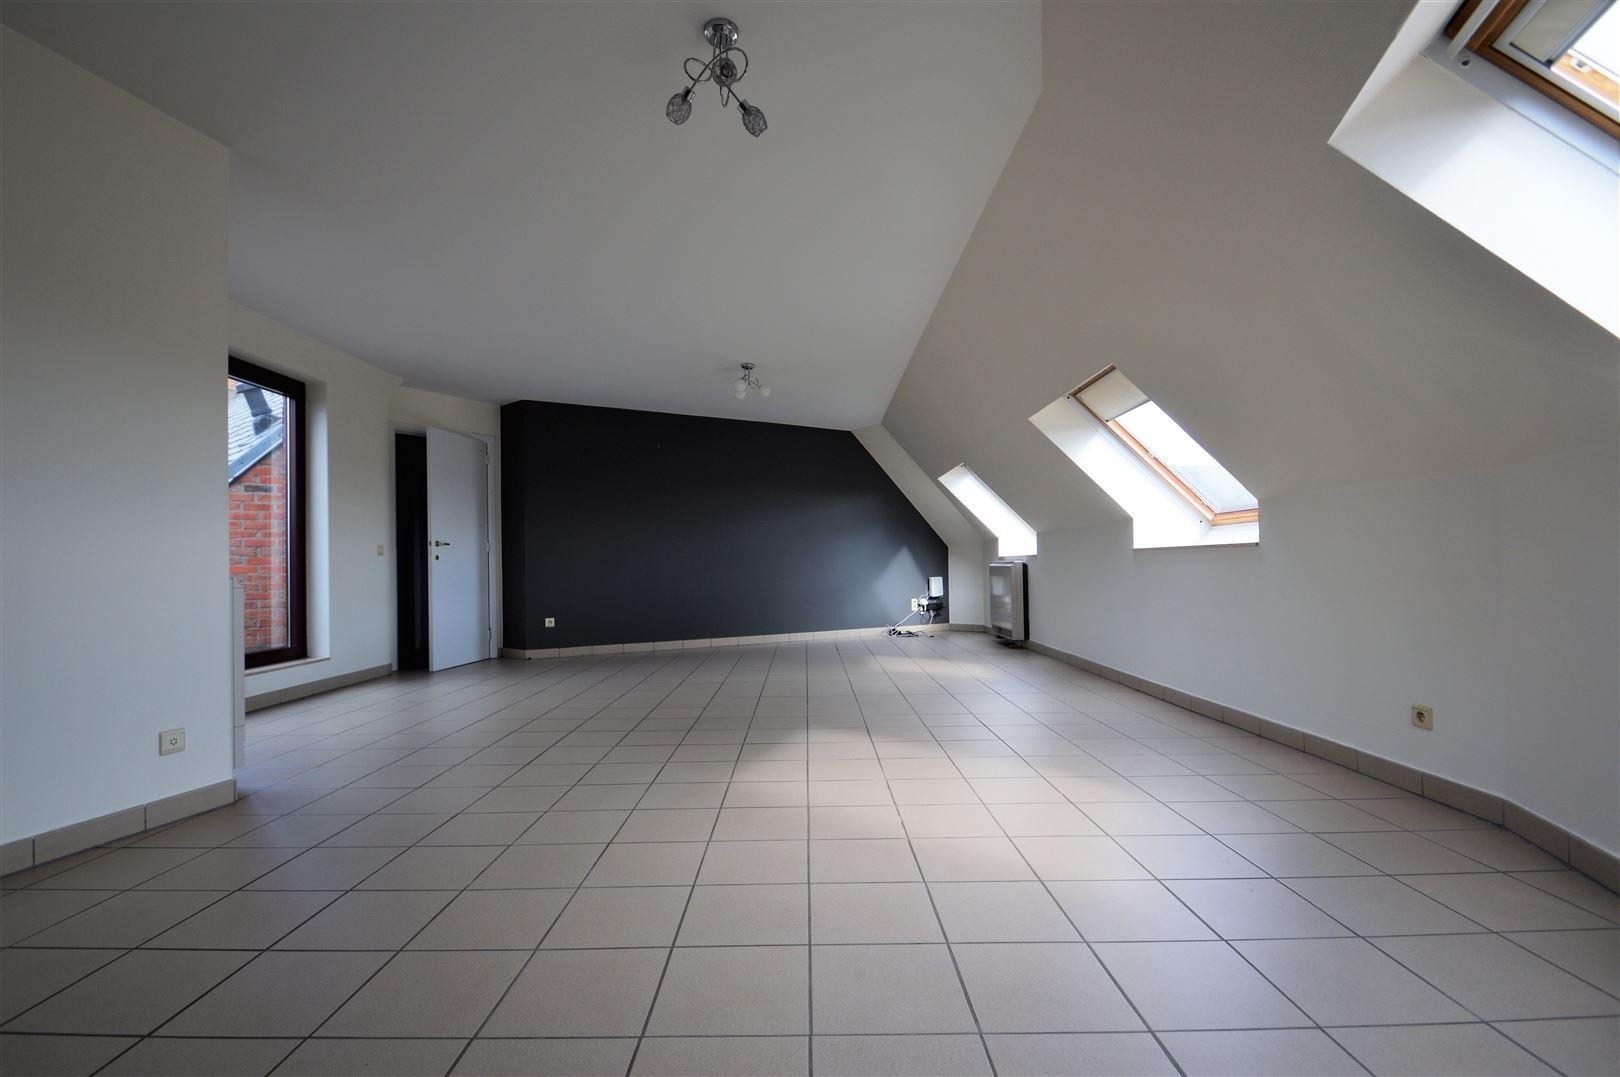 Foto 4 : Appartement te 9280 LEBBEKE (België) - Prijs € 645